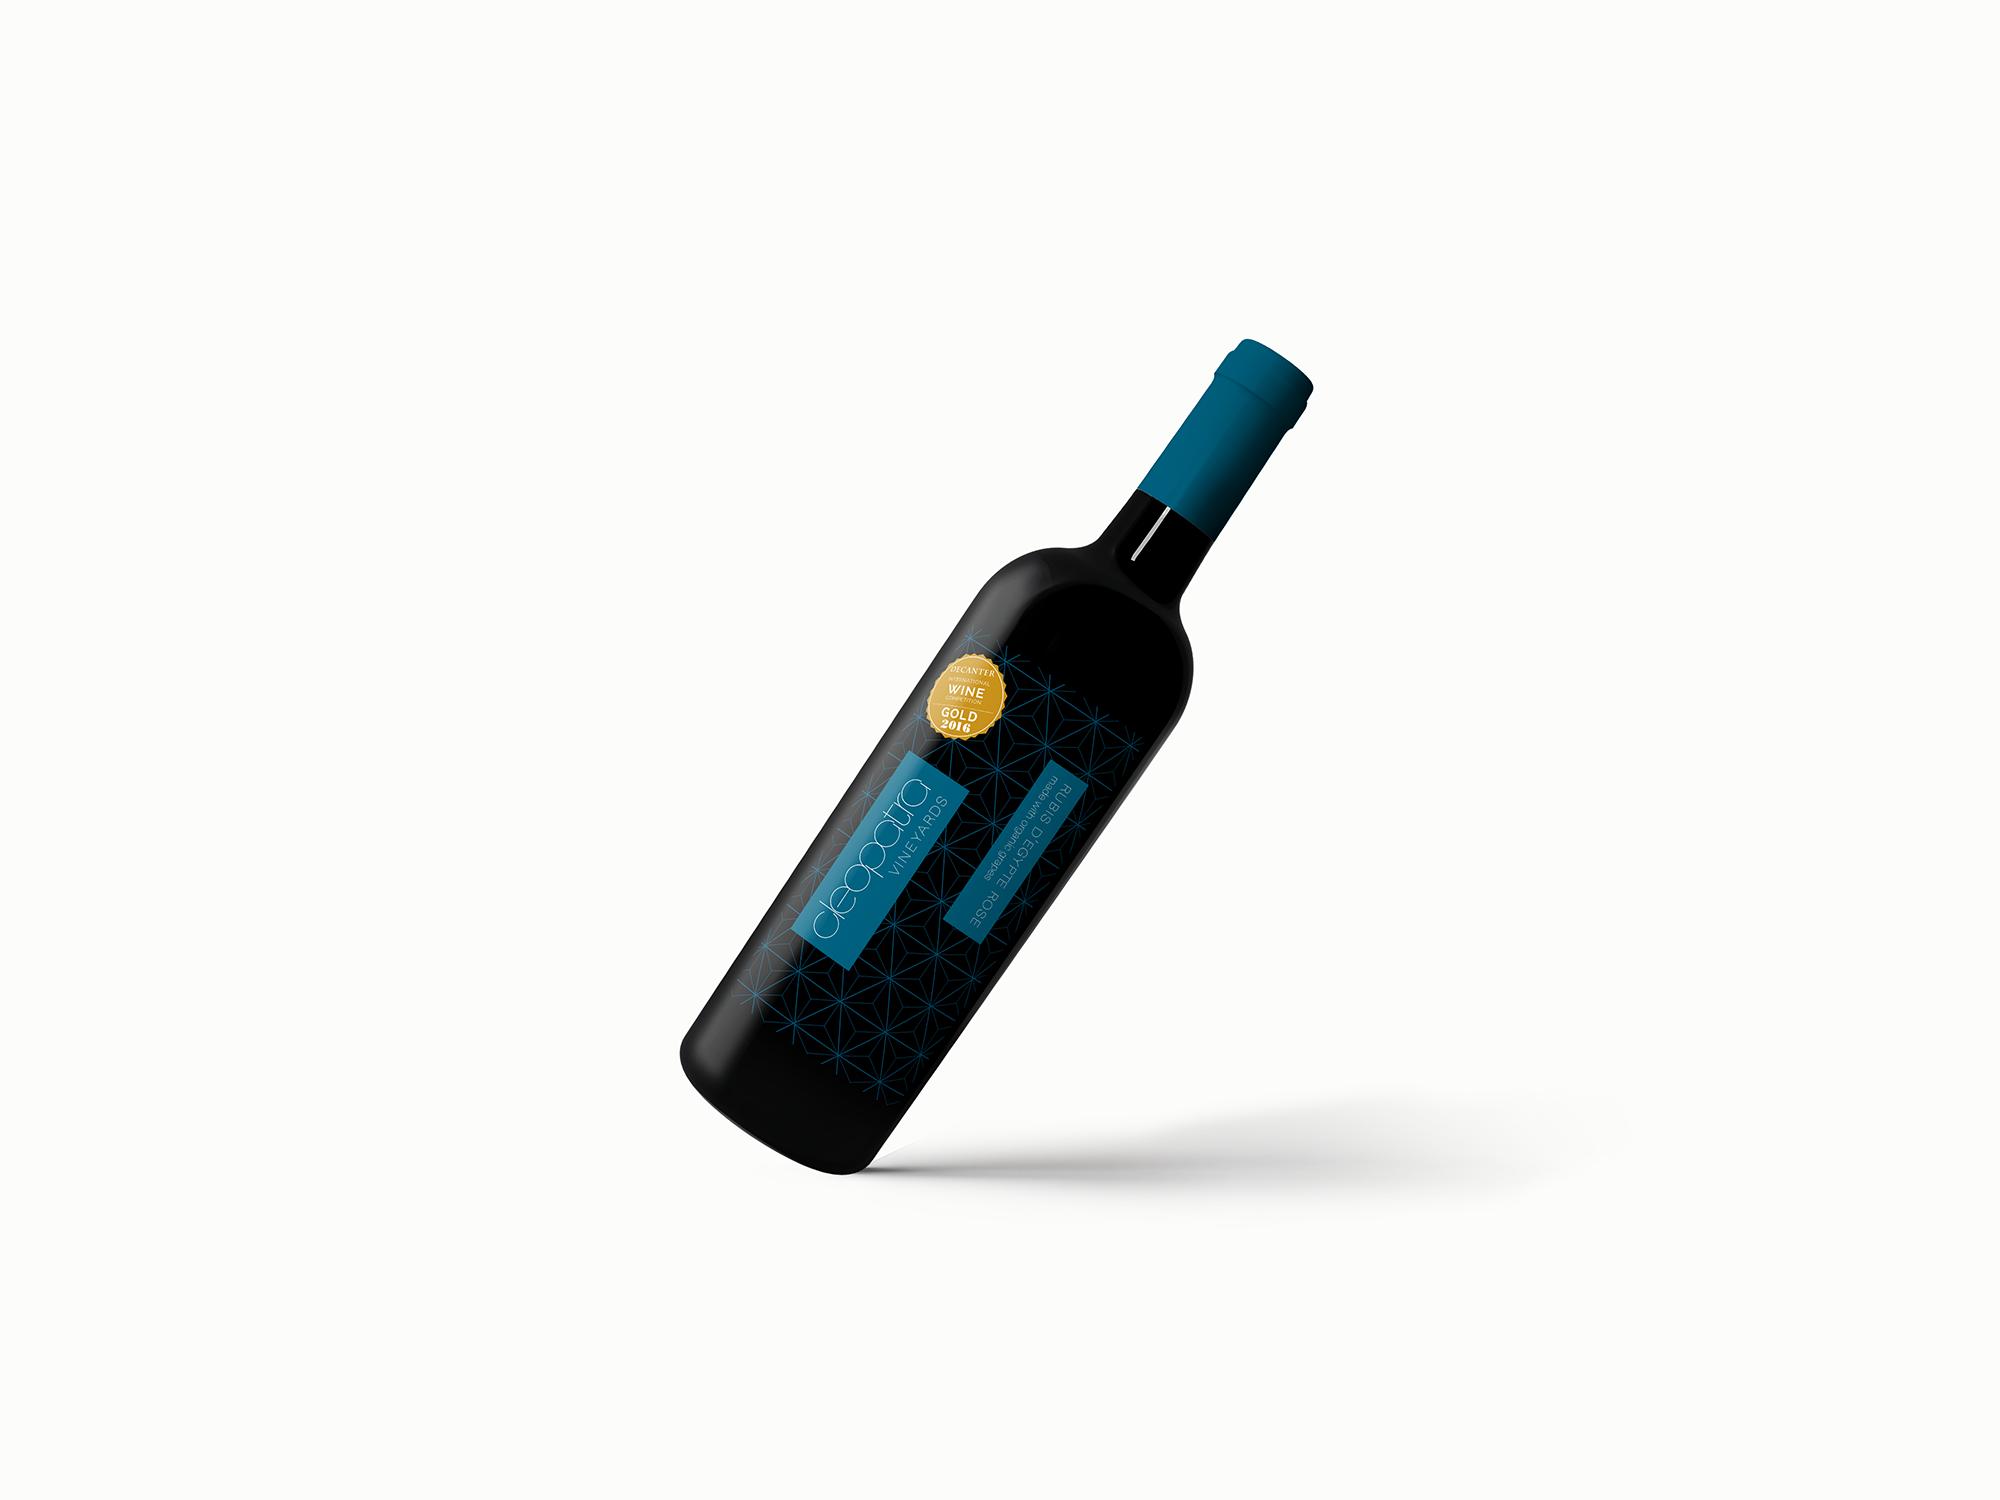 cleopatra brand identity packaging design wine bottle